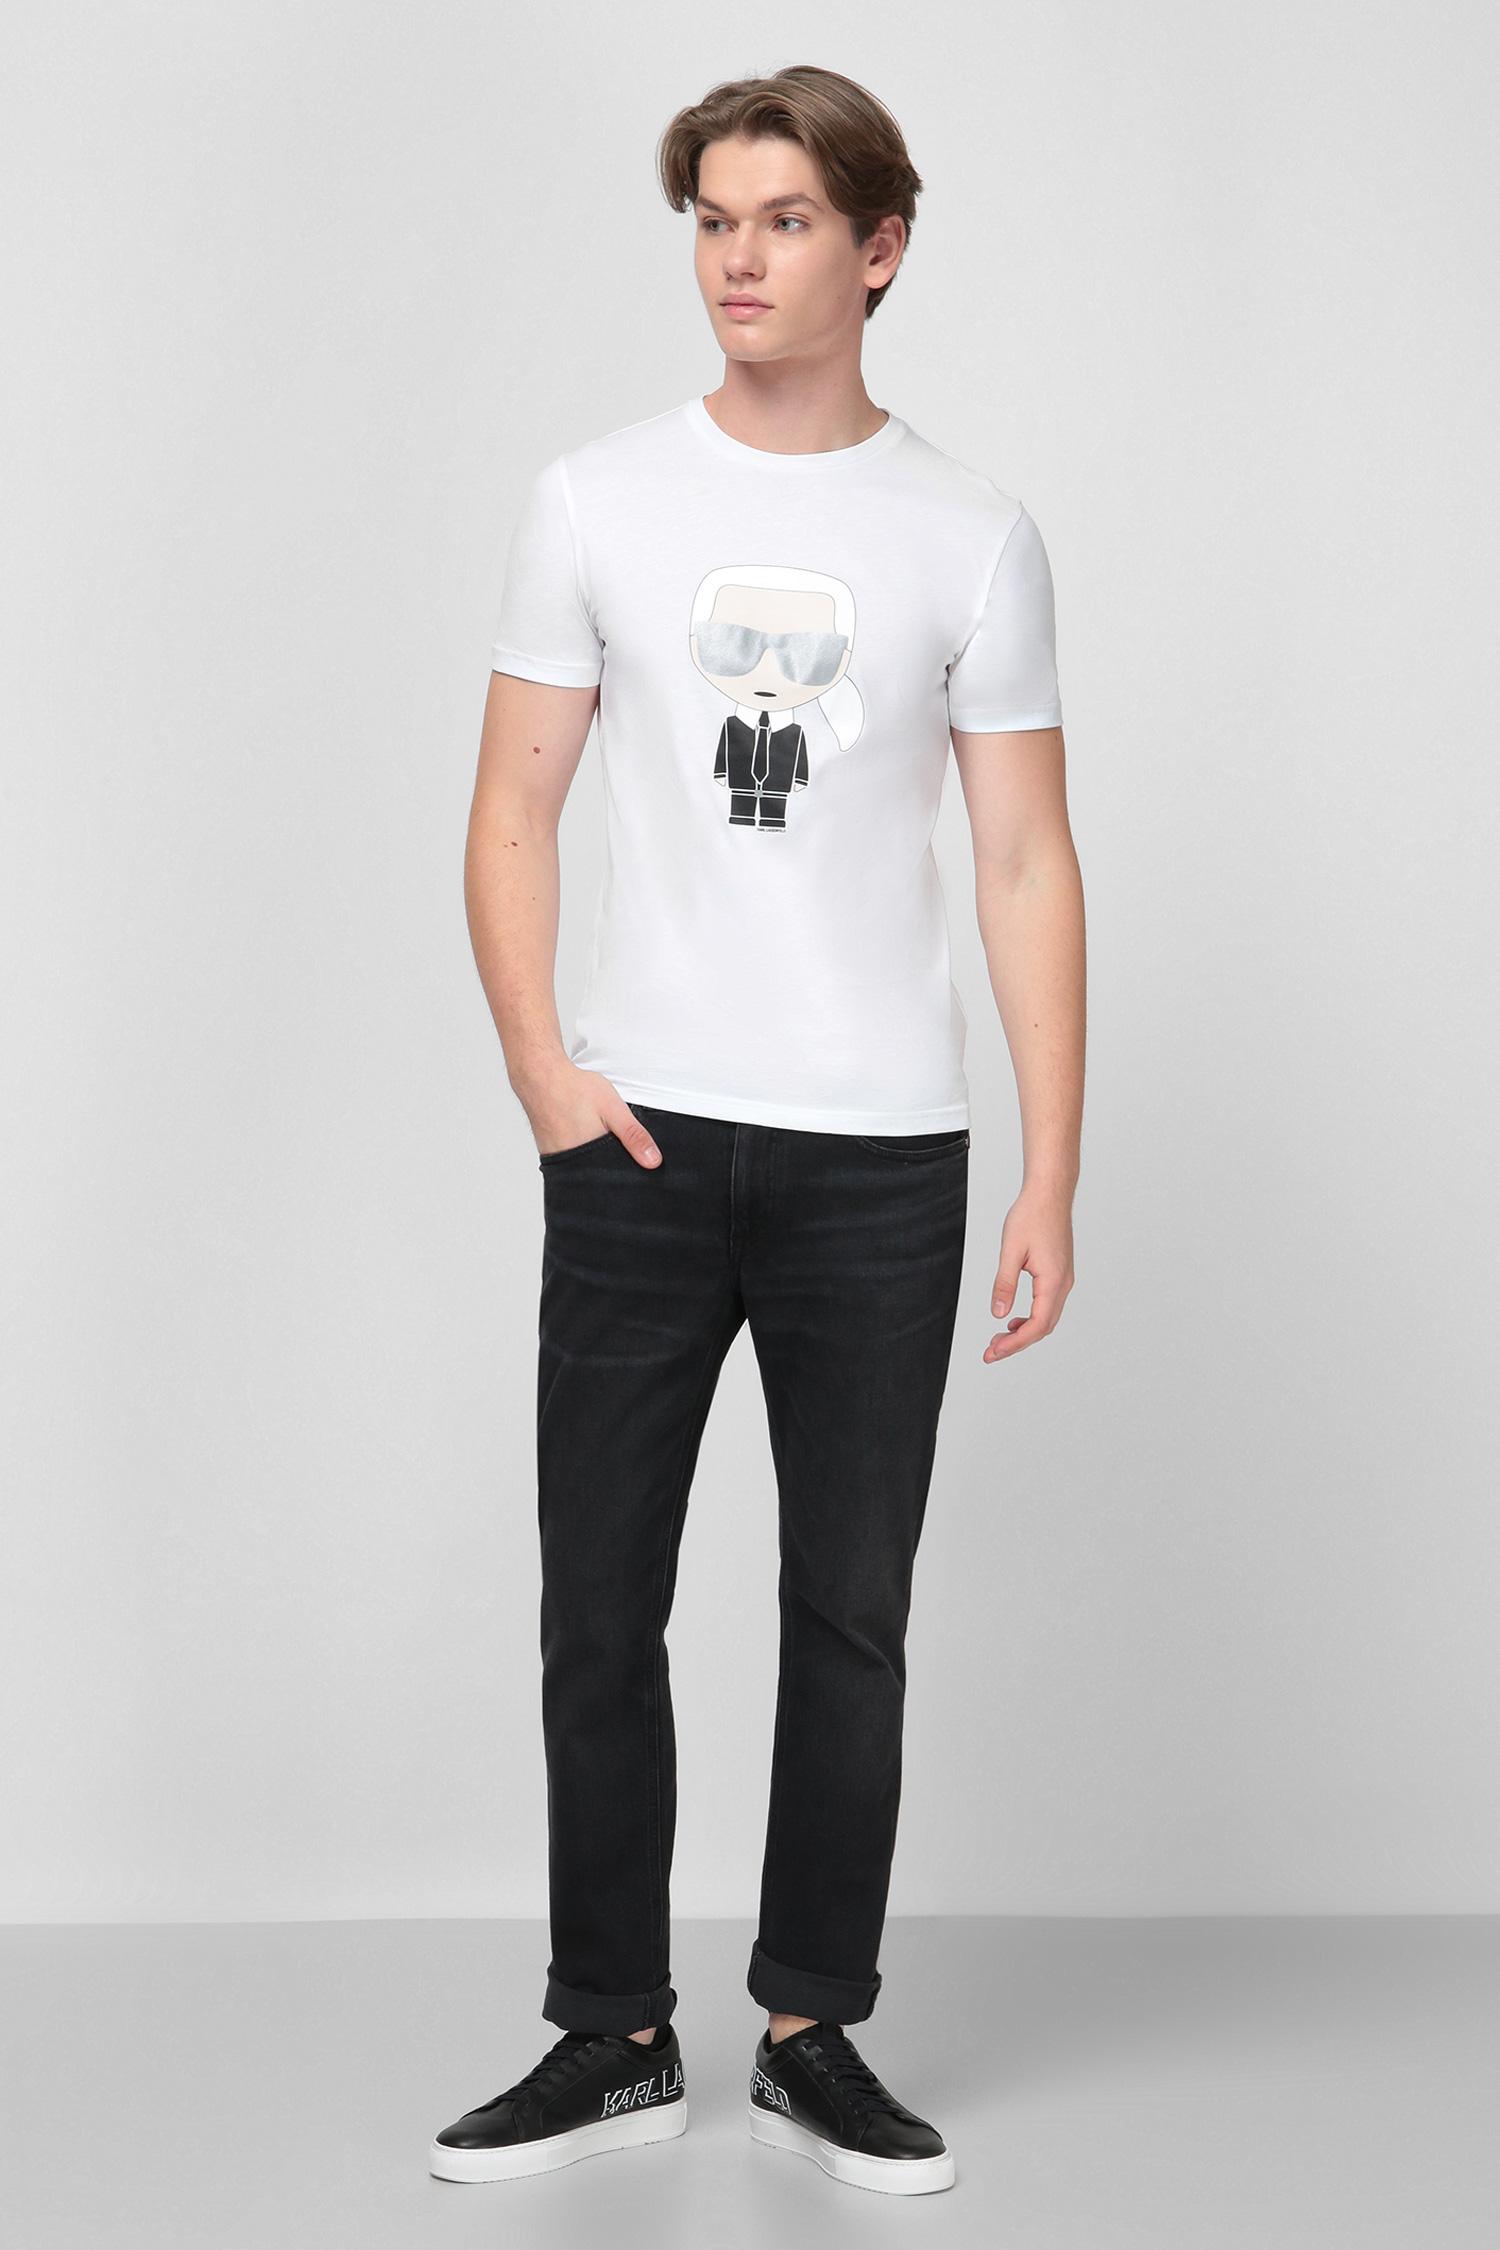 Белая футболка для парней Karl Lagerfeld 501251.755061;10